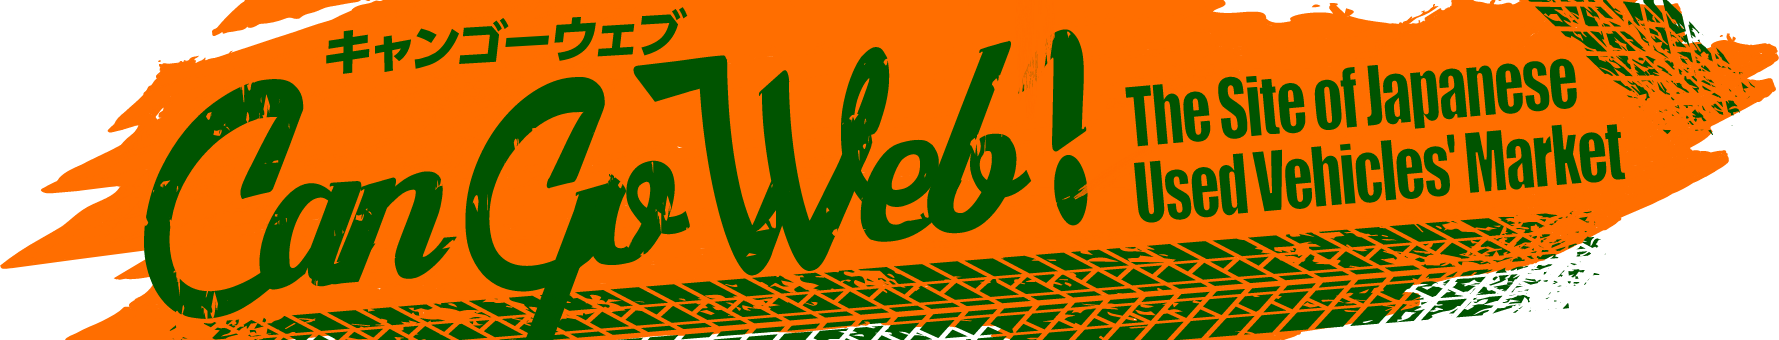 Can Go Wemb!キャンゴーウェブ